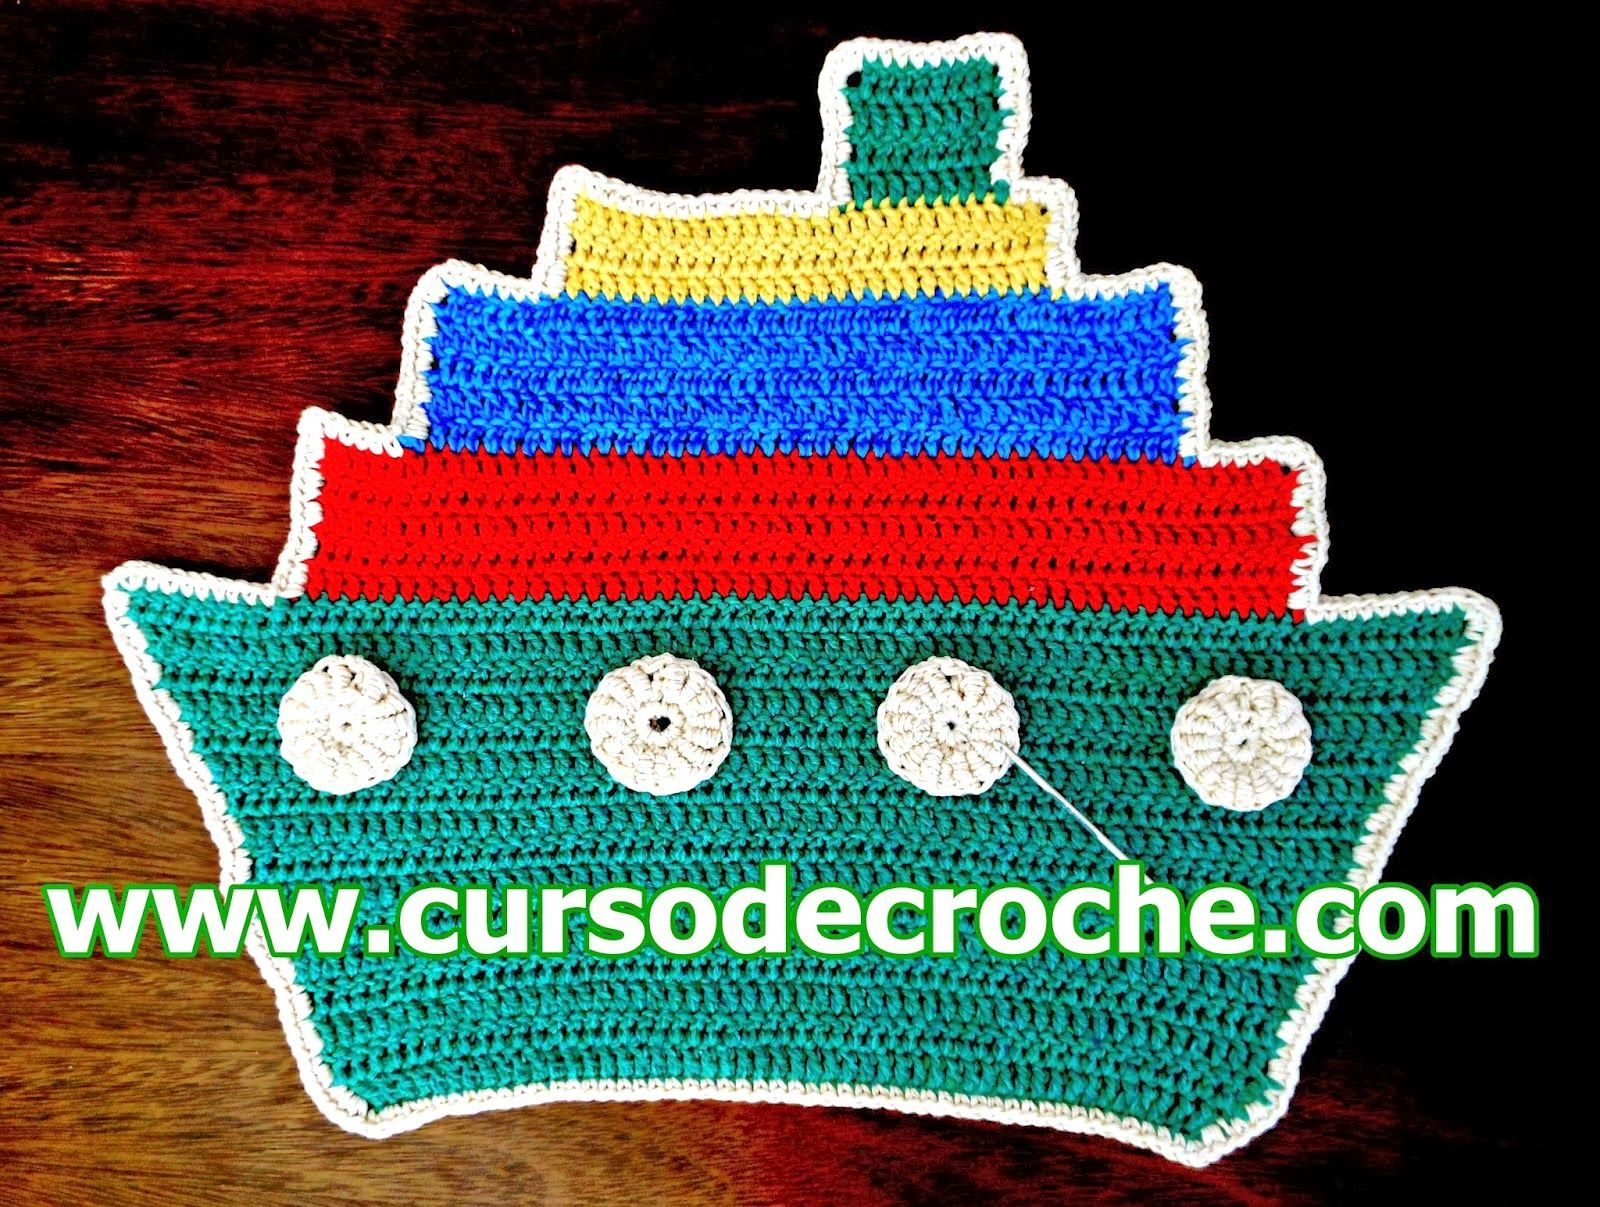 tapete aprender croche infantil navio coloridos sobras fios edinir-croche blog youtube